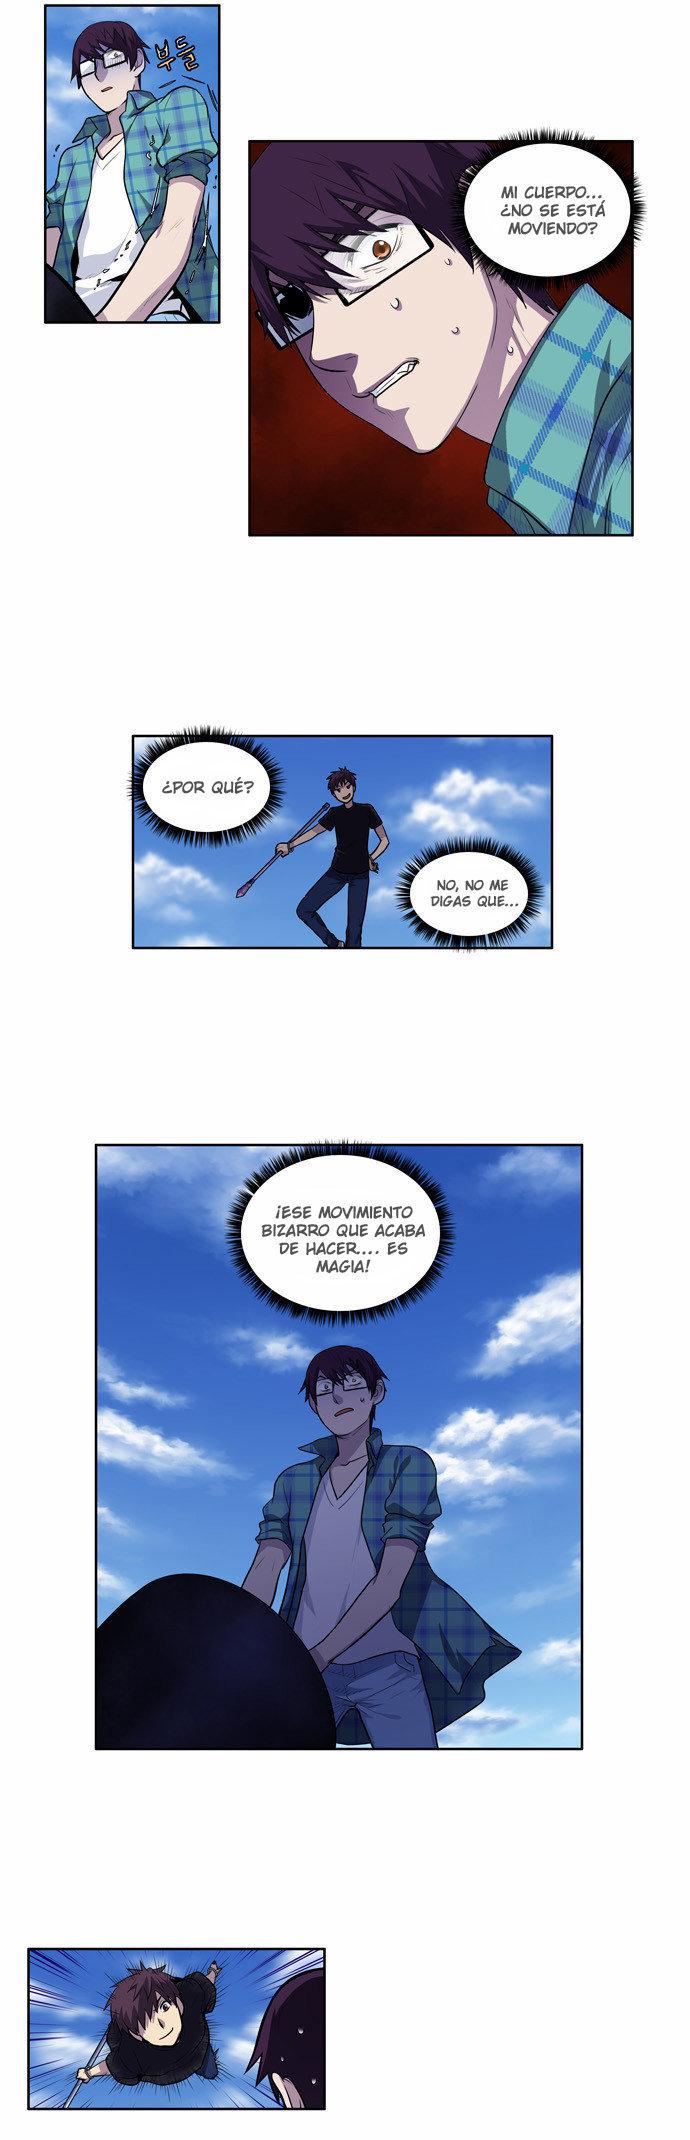 http://c5.ninemanga.com/es_manga/61/1725/442818/202f46e749ba97e38bb0cd9aca4ca010.jpg Page 6